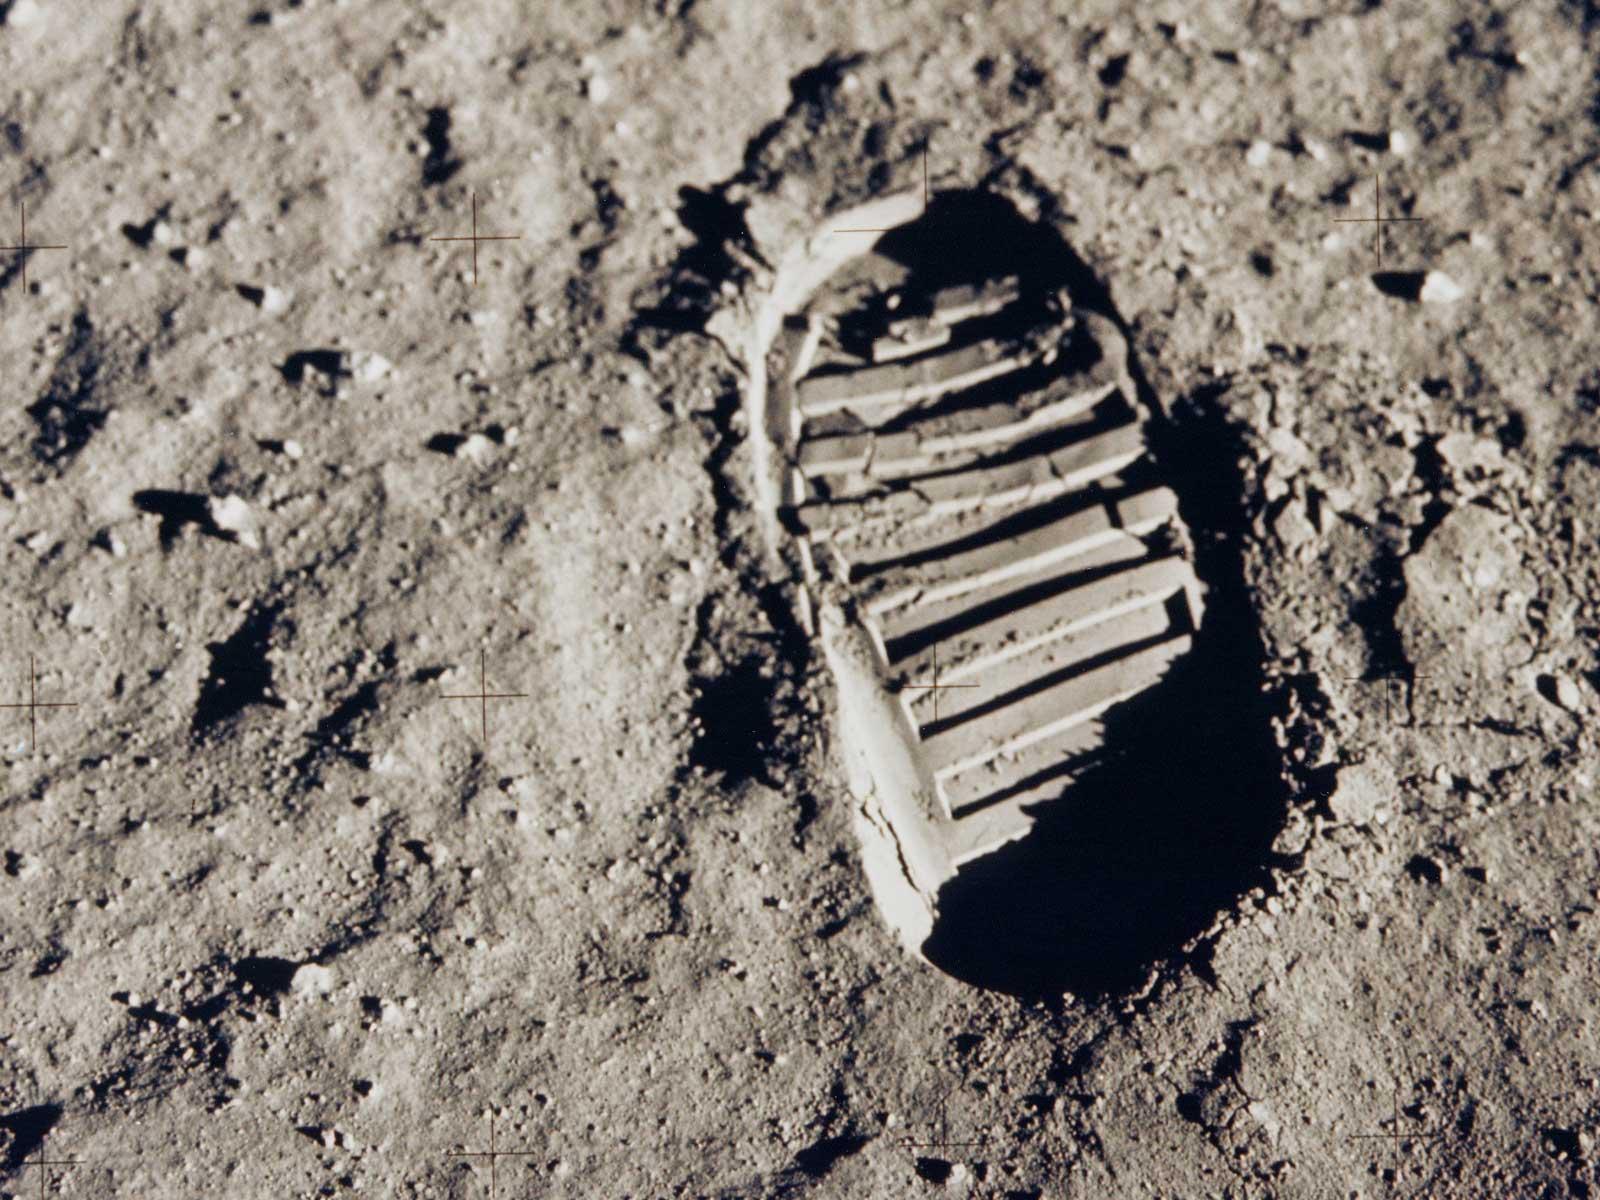 SPACE WALLPAPER Apollo 11 Bootprint 1600x1200